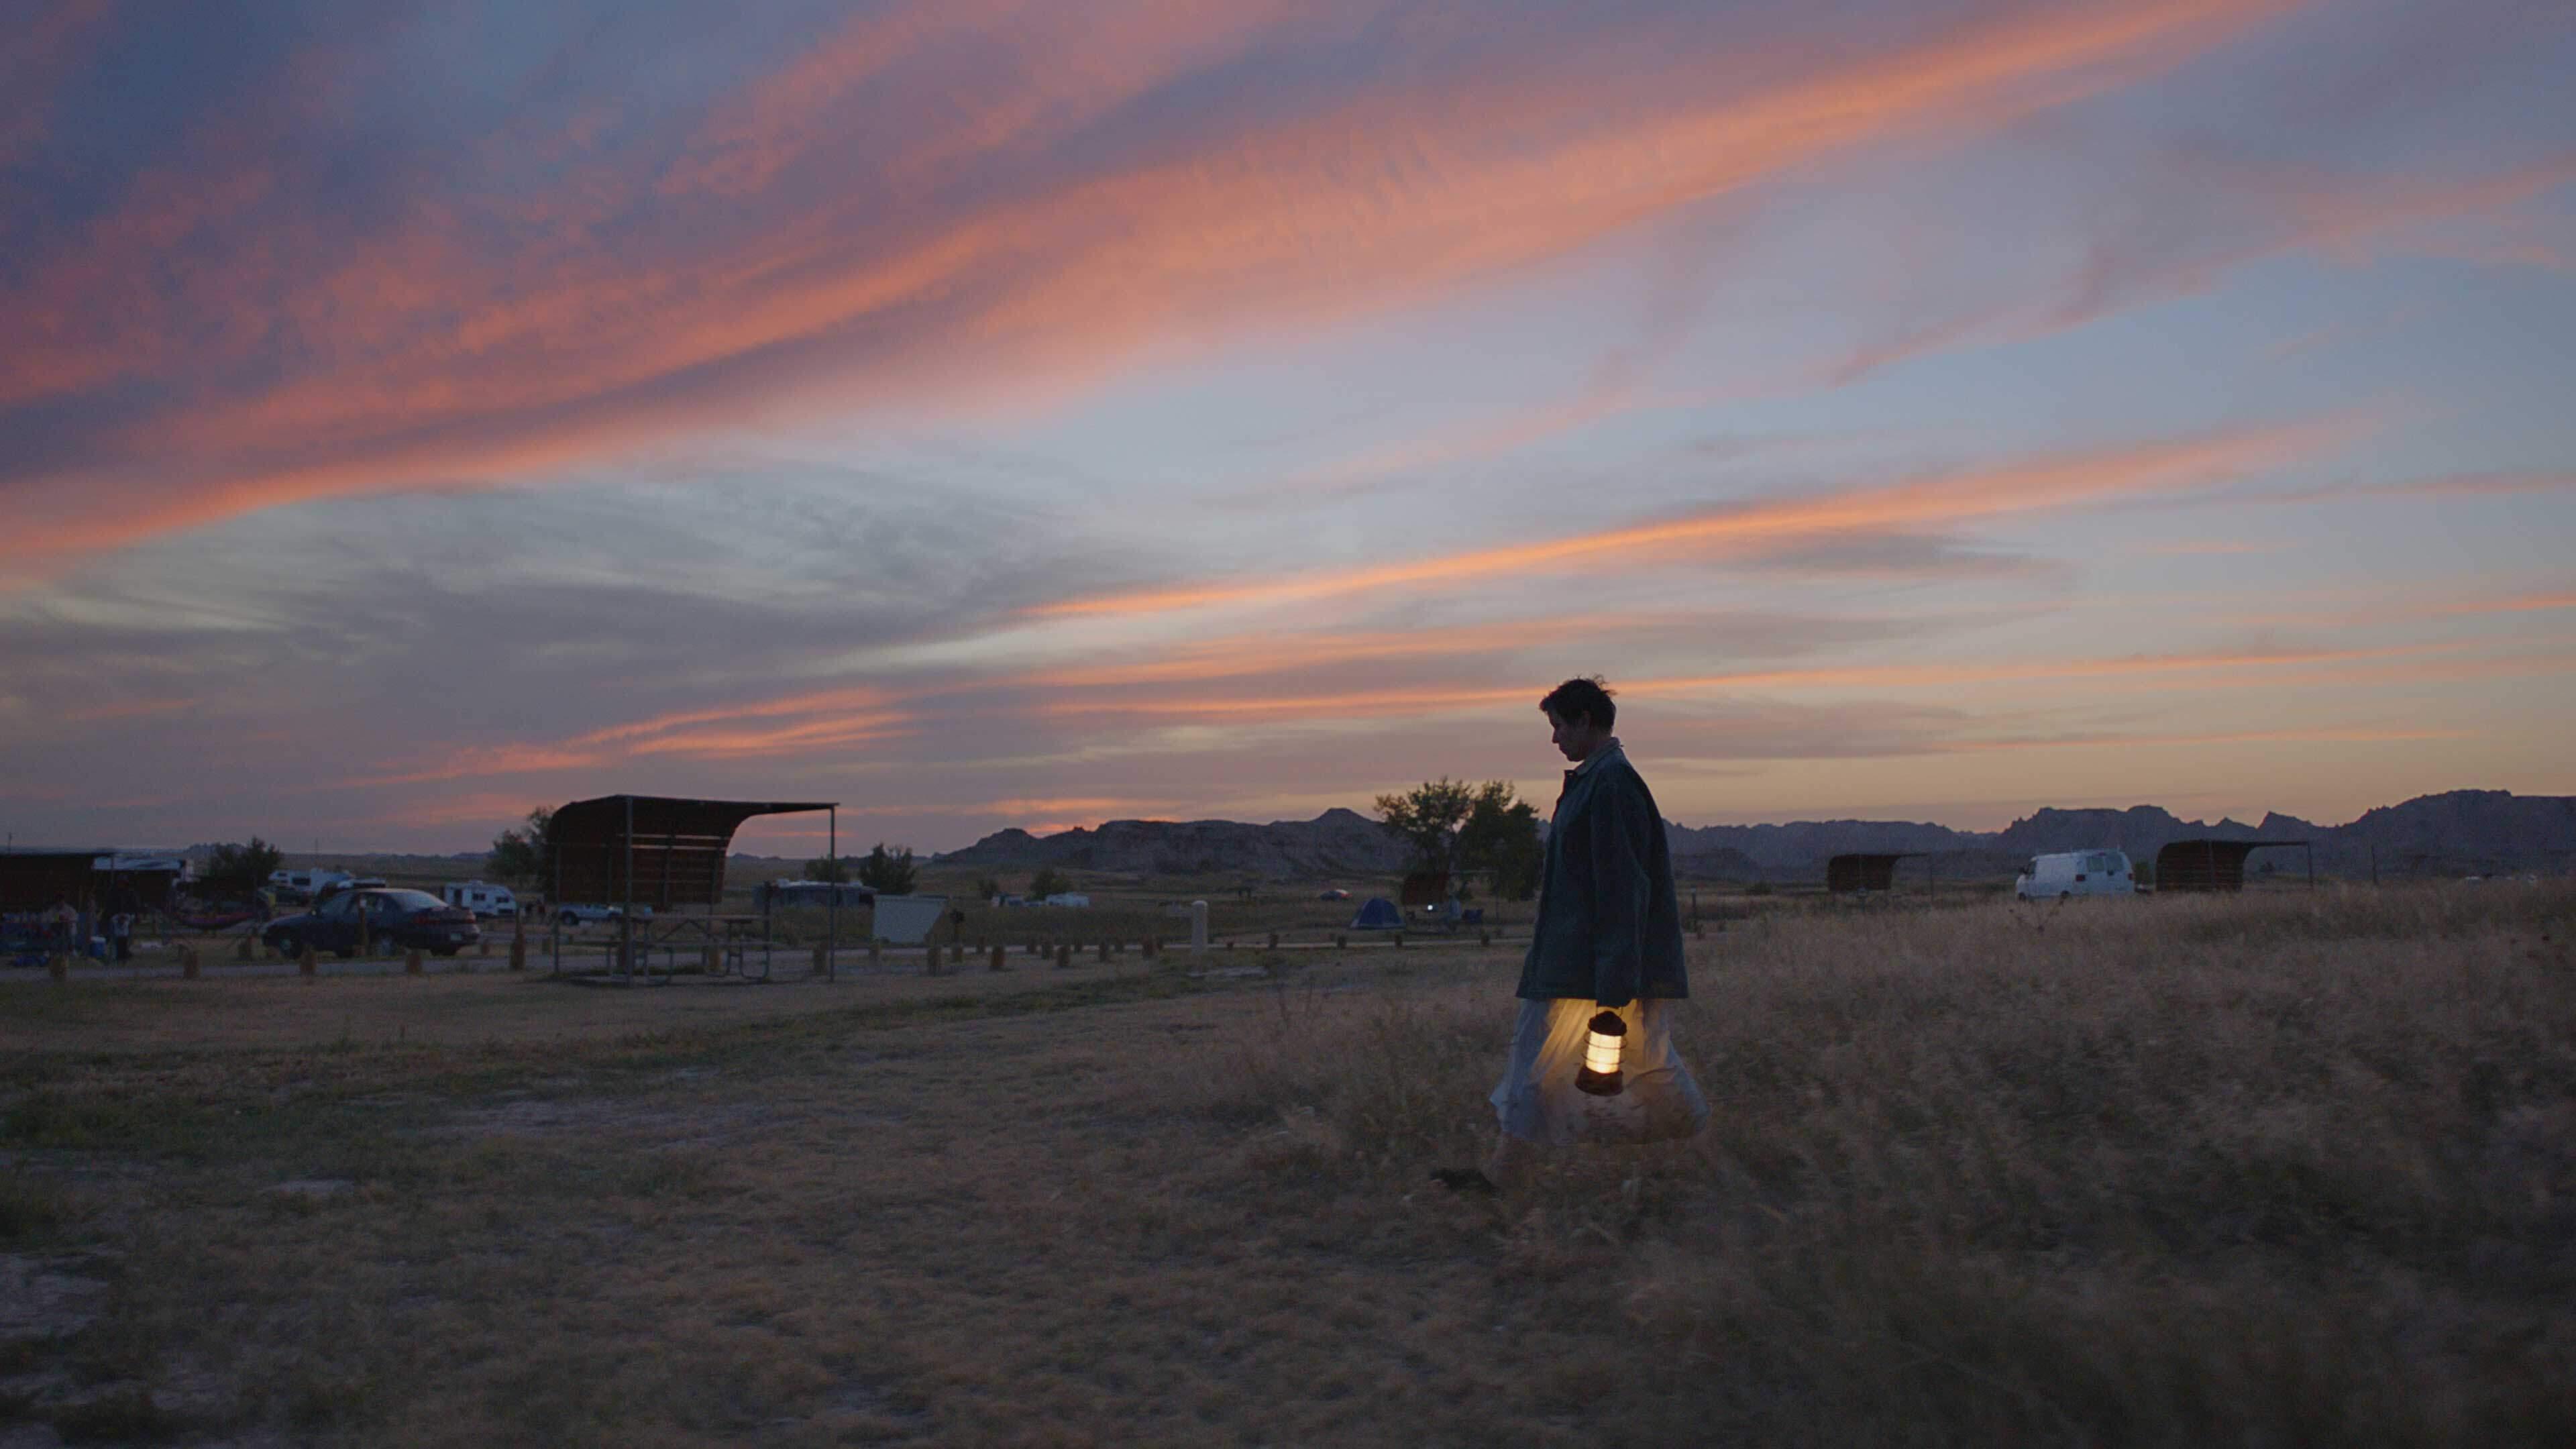 Nomadland recensione film di Chloé Zhao con Frances McDormand